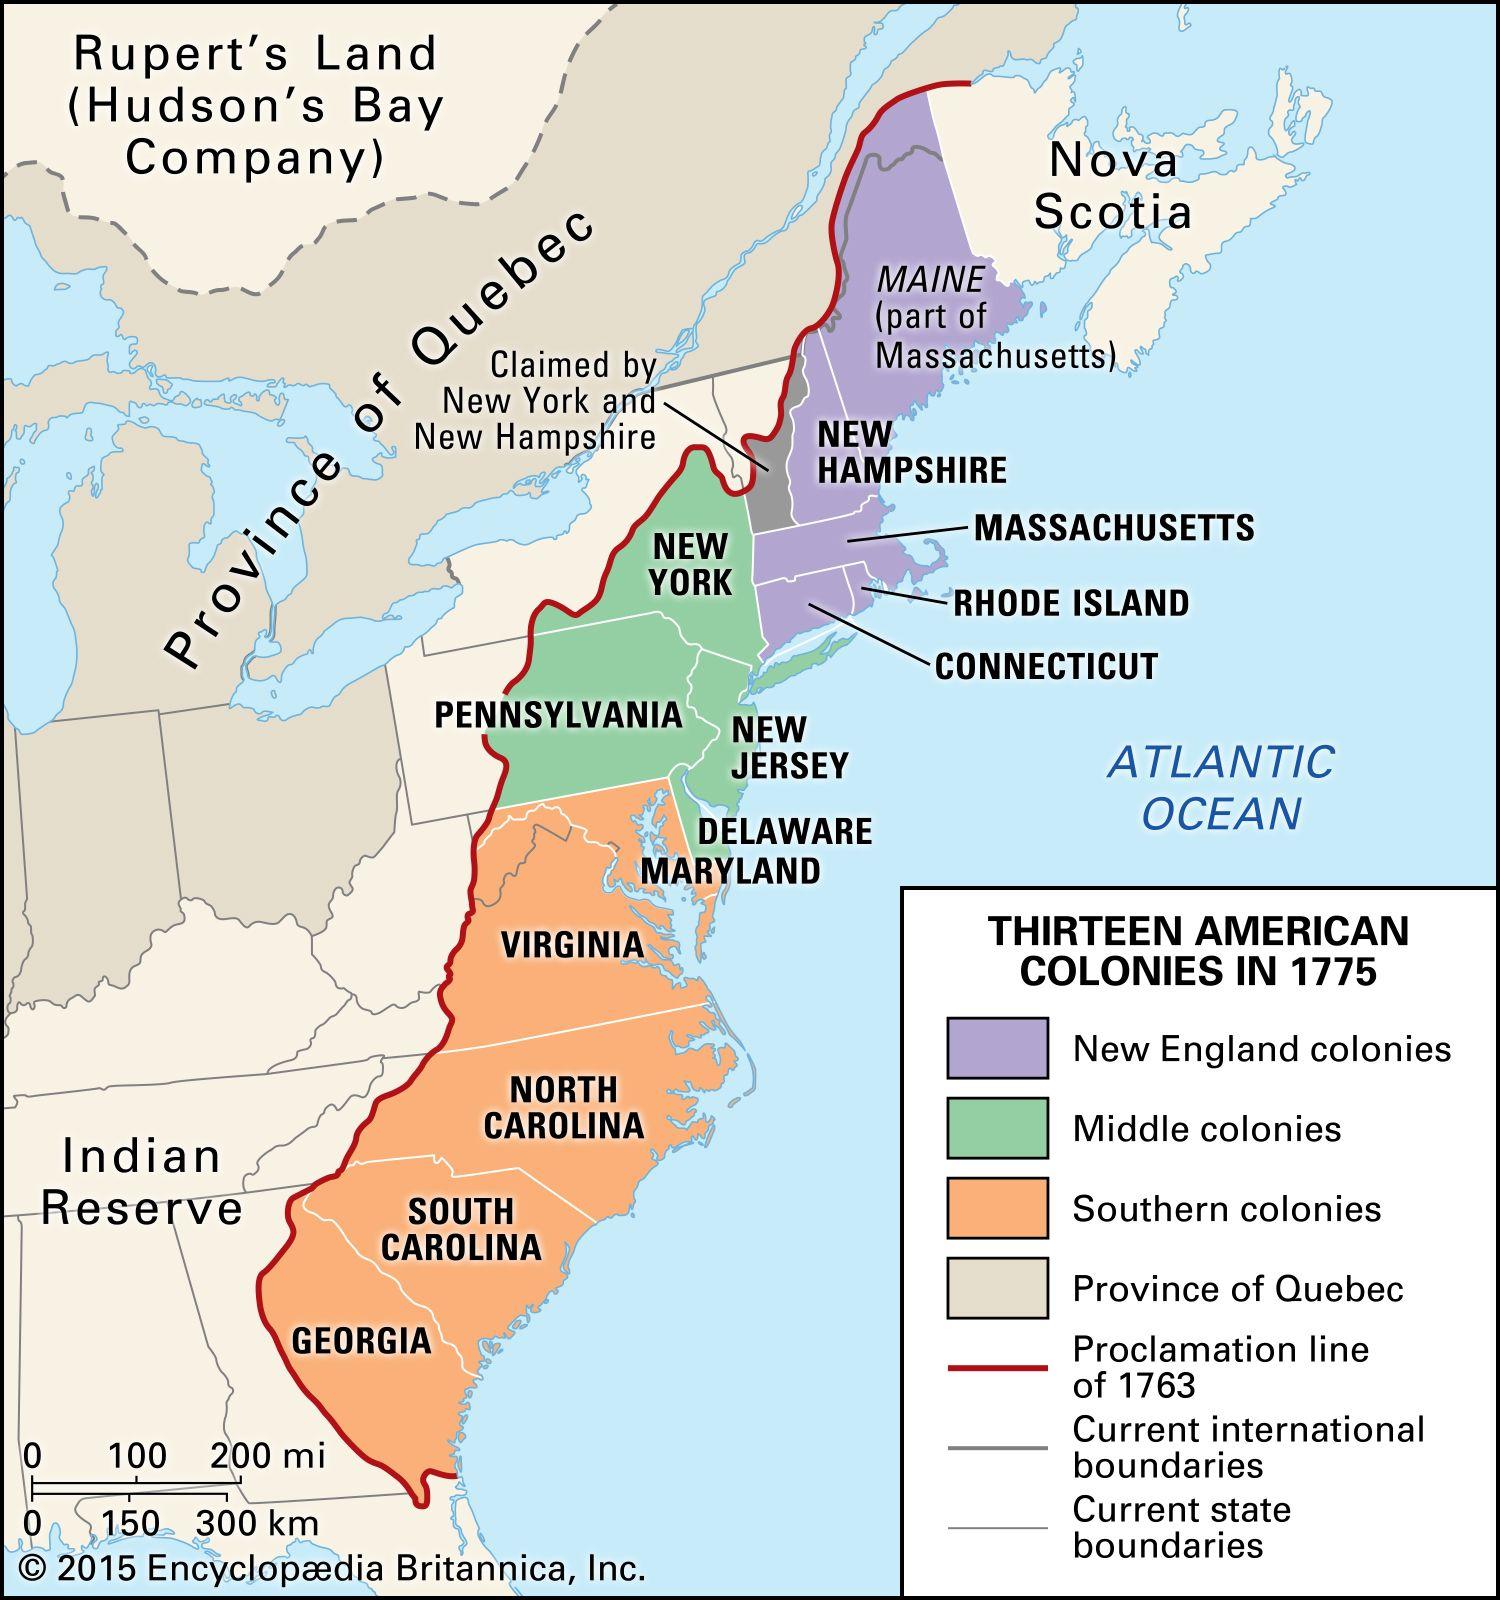 worksheet Revolutionary War Map Worksheet 180929 050 4ead431a jpg revolutionary war pinterest revolutionaries